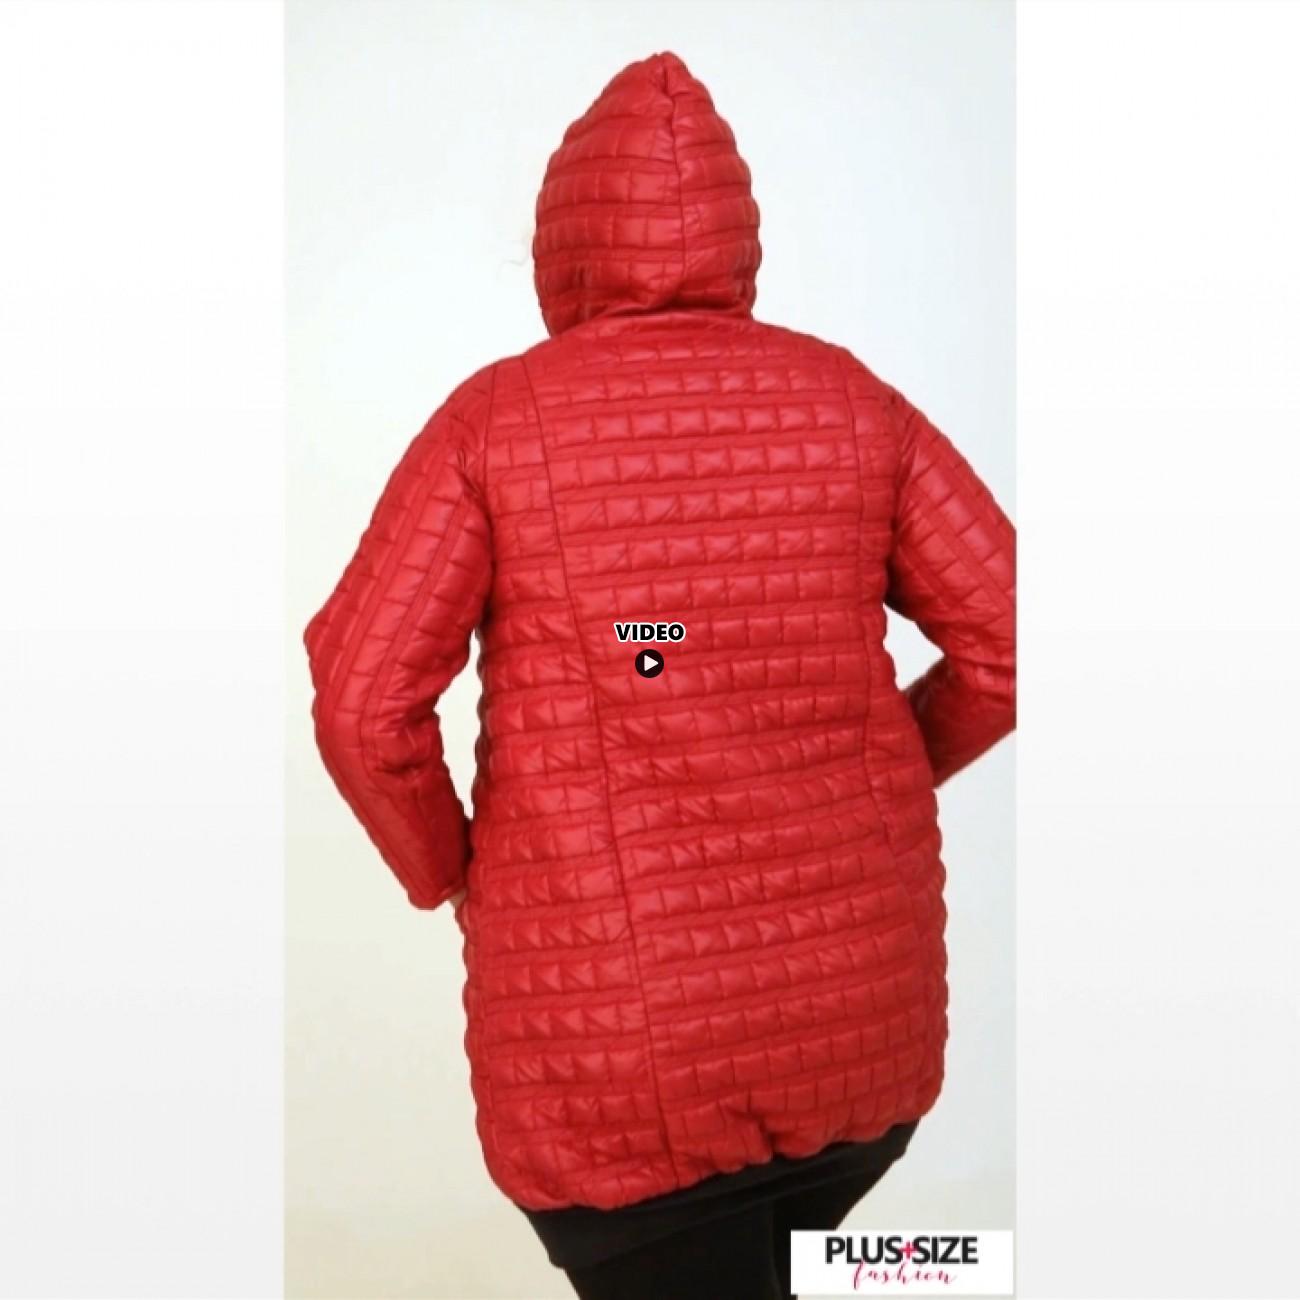 B20-6629 Jacket with hood - Bordeaux